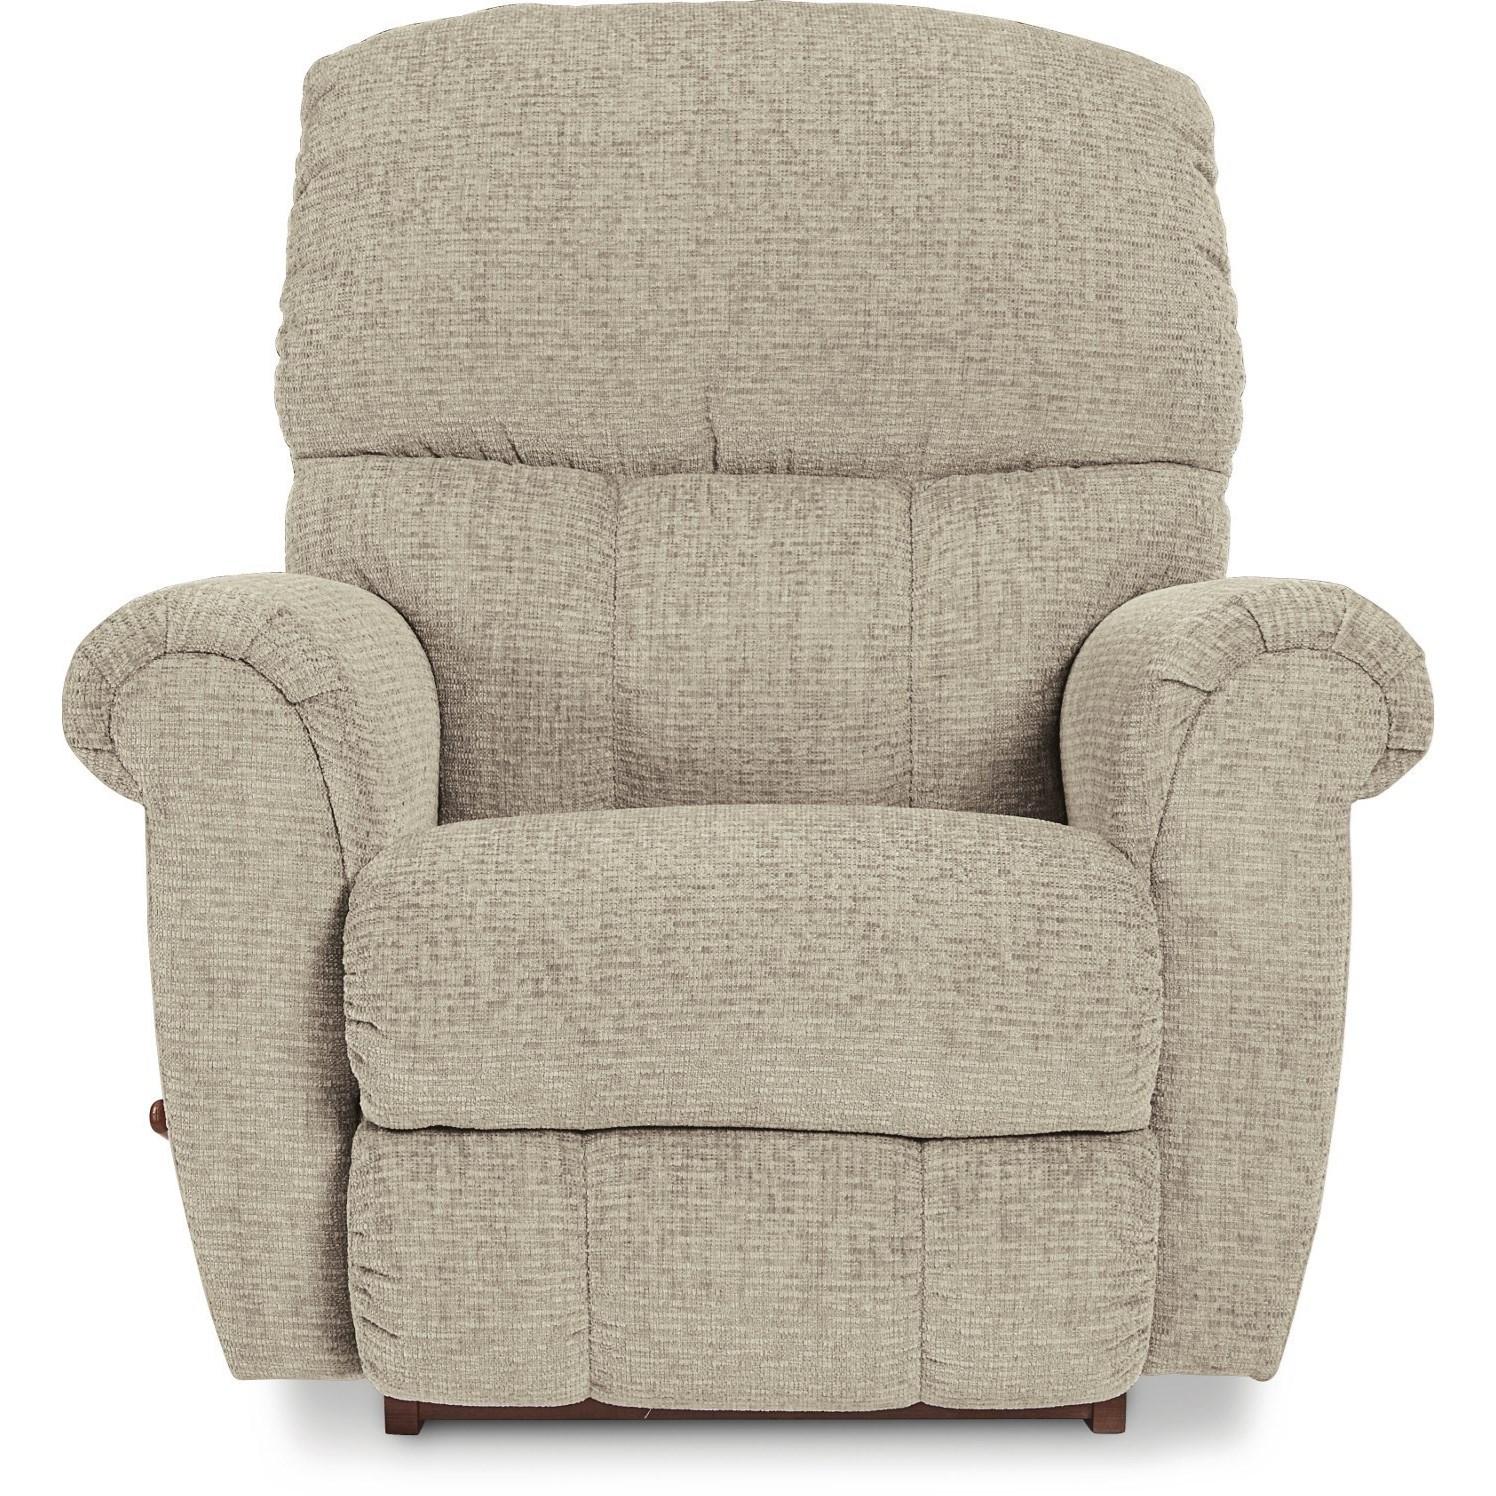 Briggs RECLINA-ROCKER® by La-Z-Boy at Bennett's Furniture and Mattresses